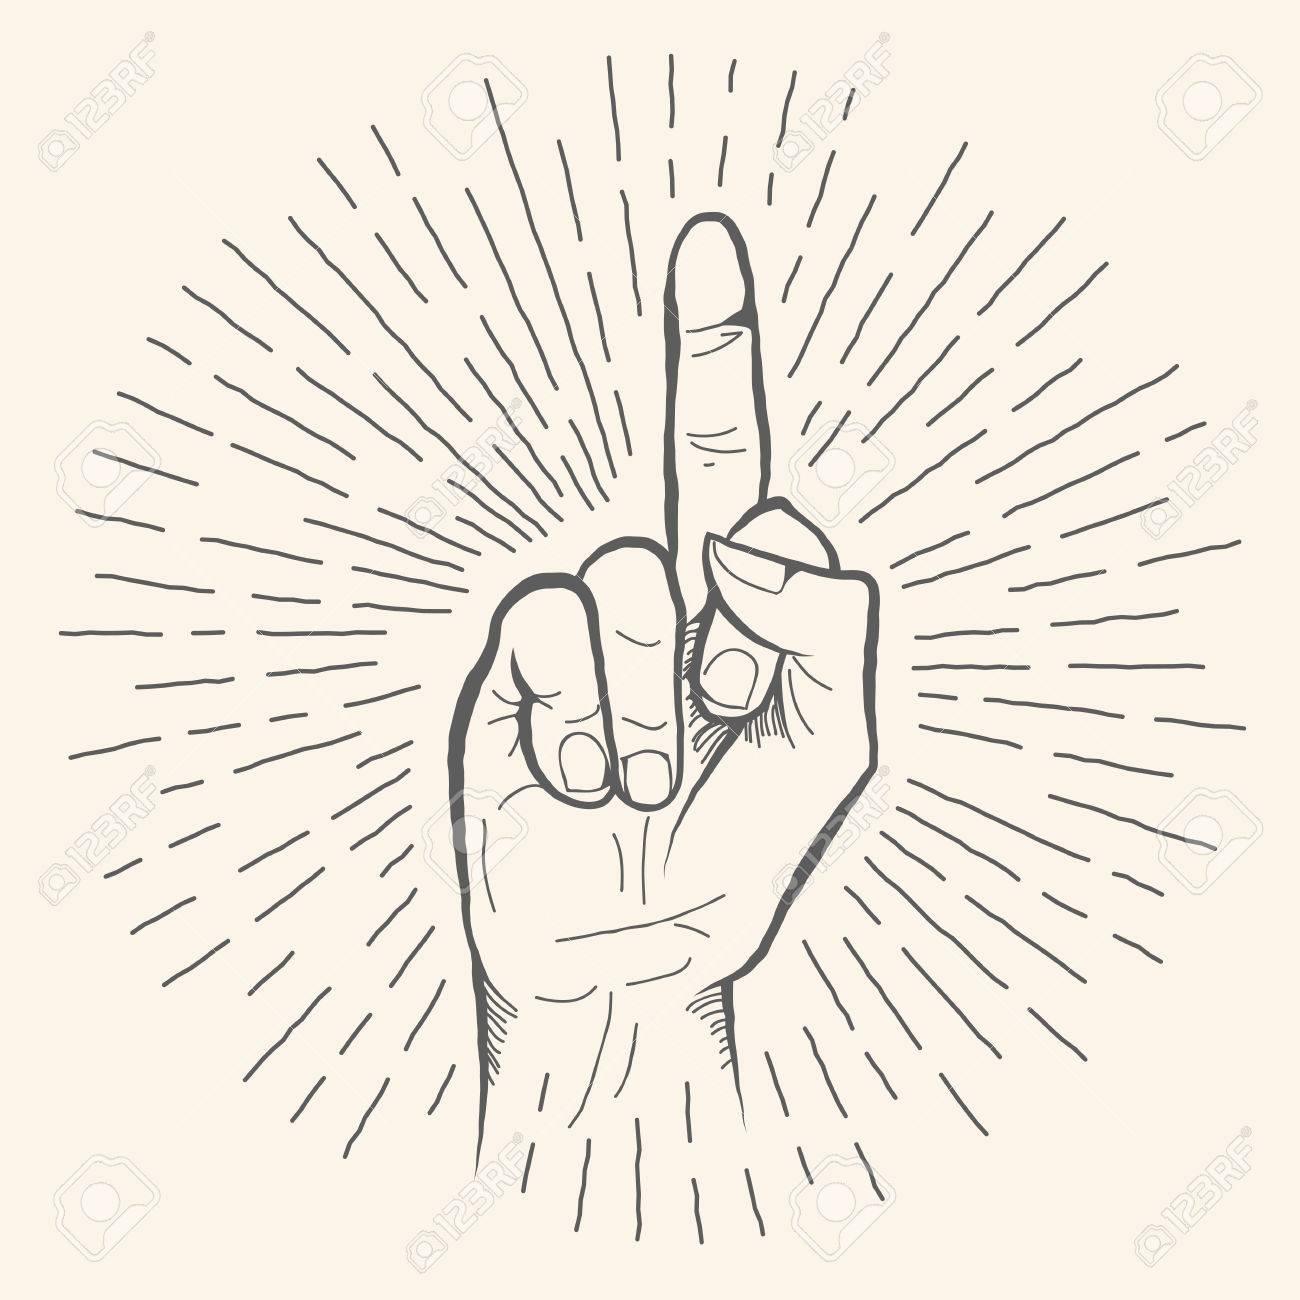 1300x1300 Vector Hand Gesture. Obscene Fuck Off Hand Drawn Sign. Vector